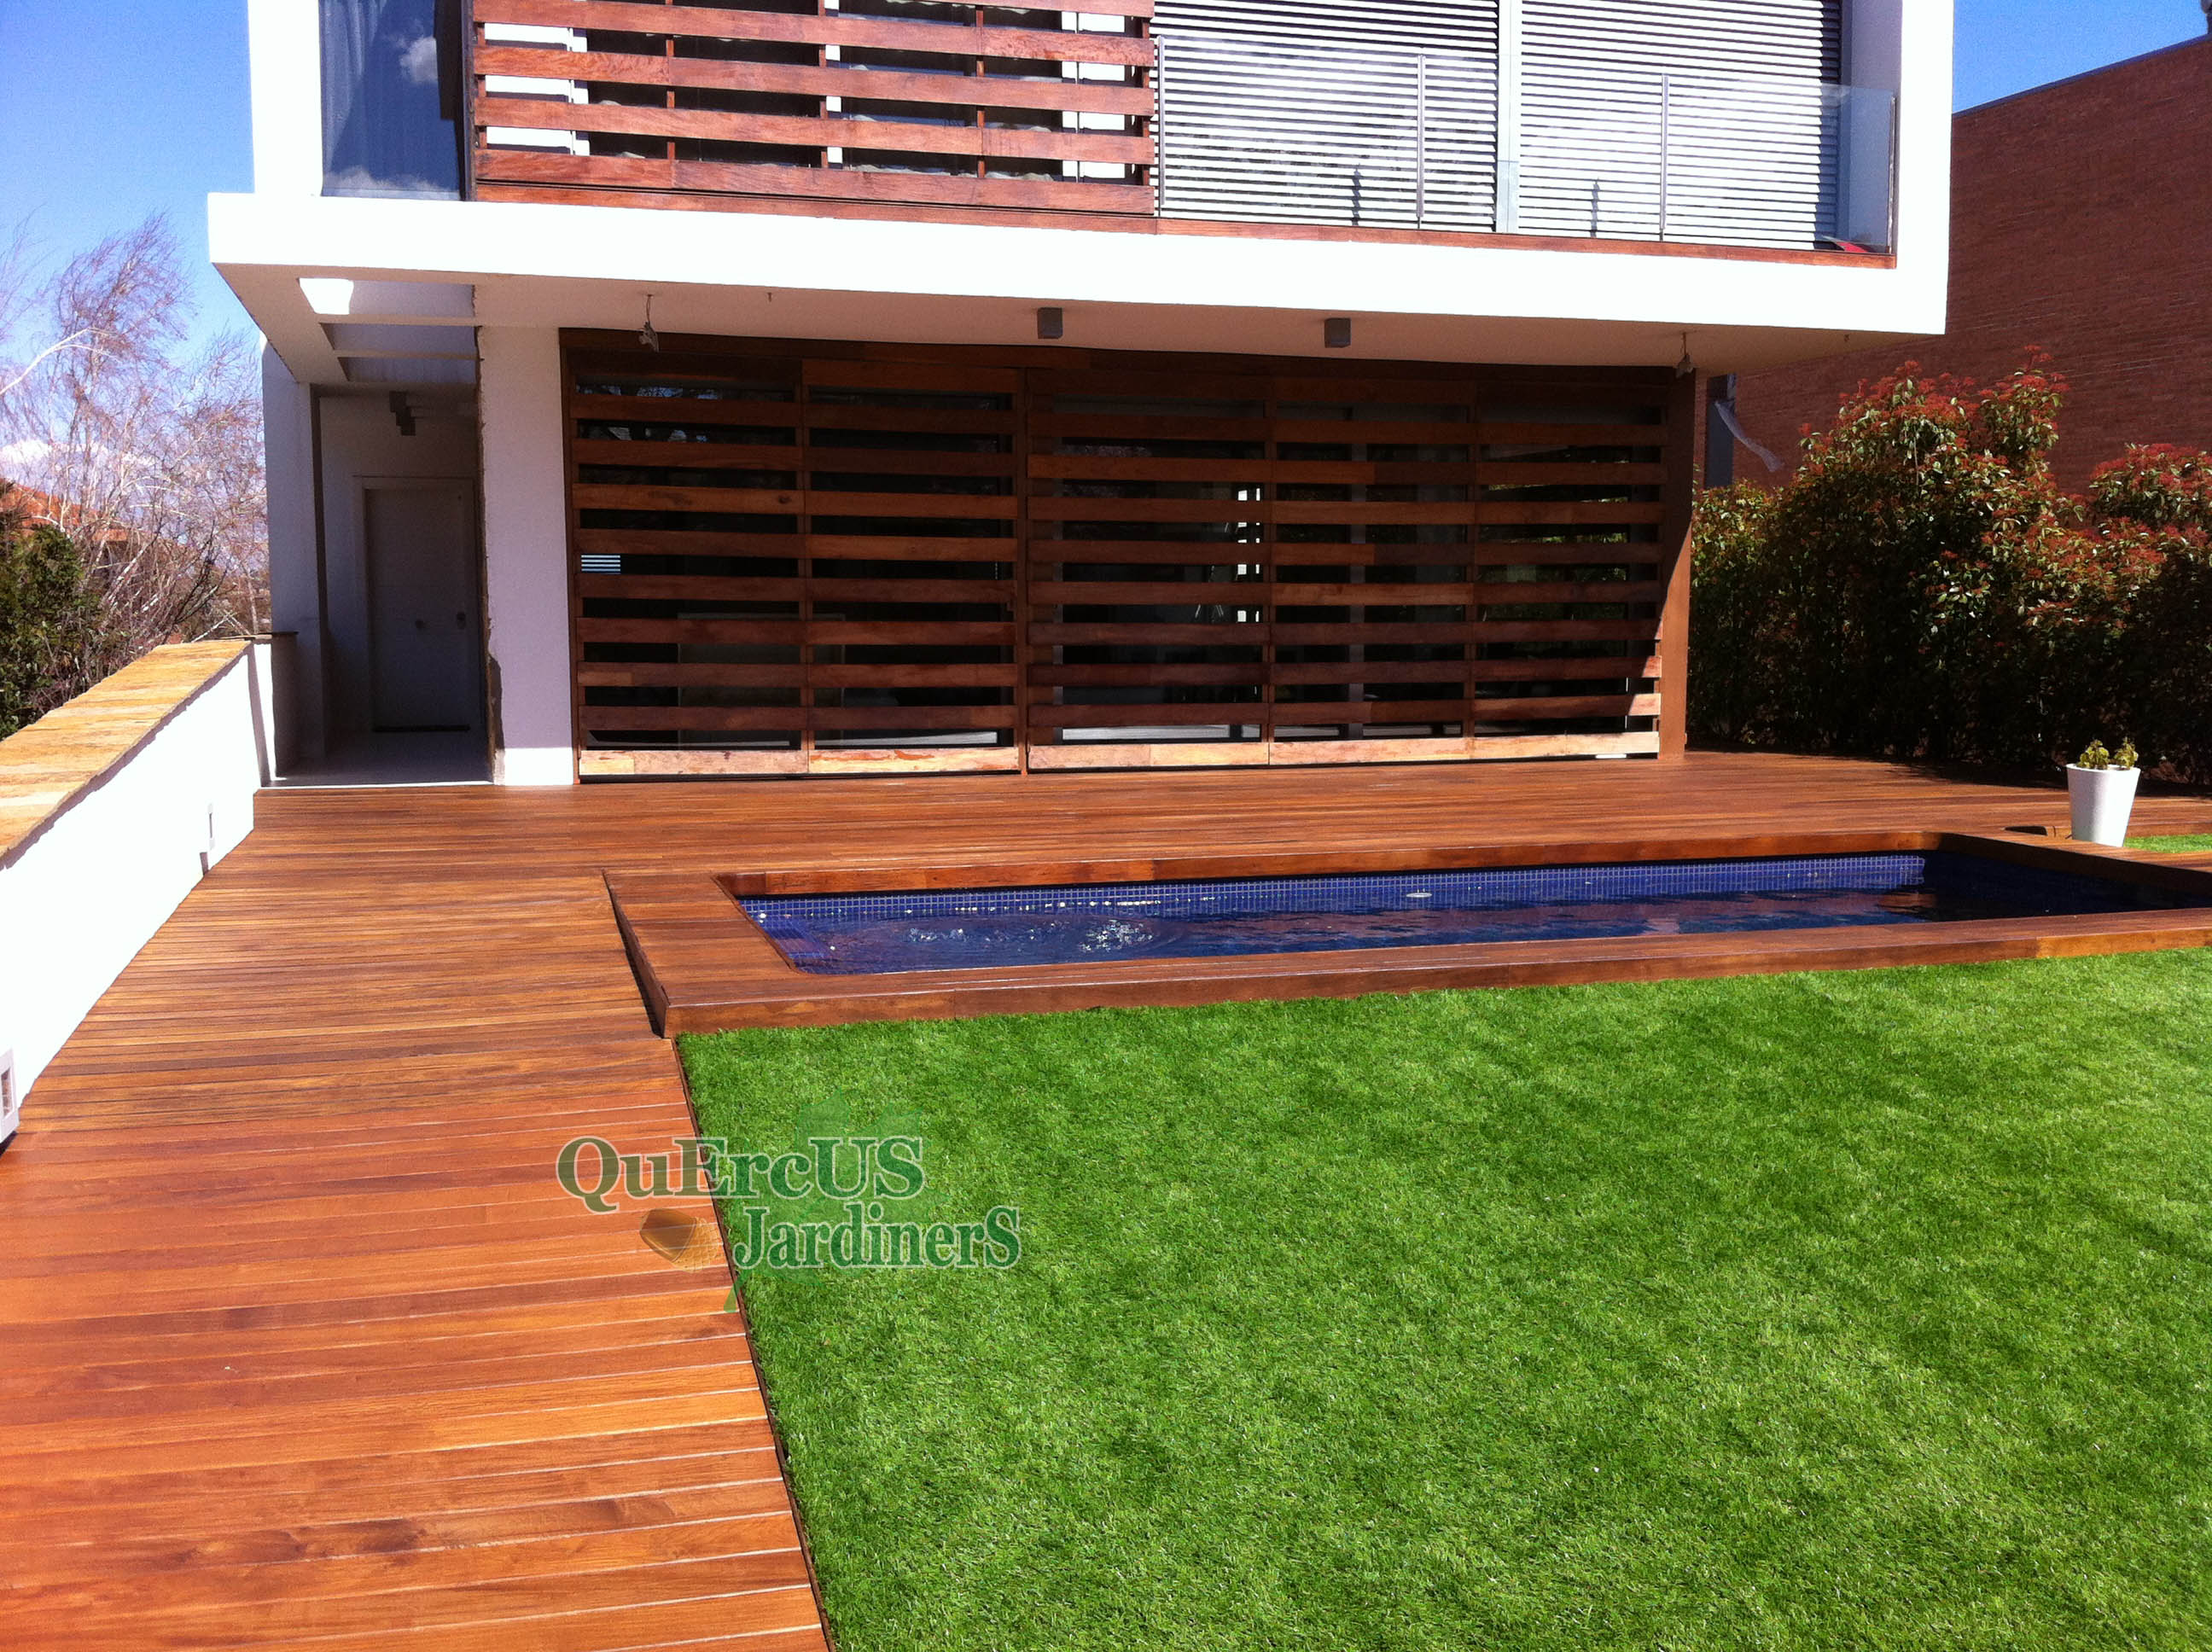 Terrazas con cesped artificial y tarima great actualmente for Tarima piscina